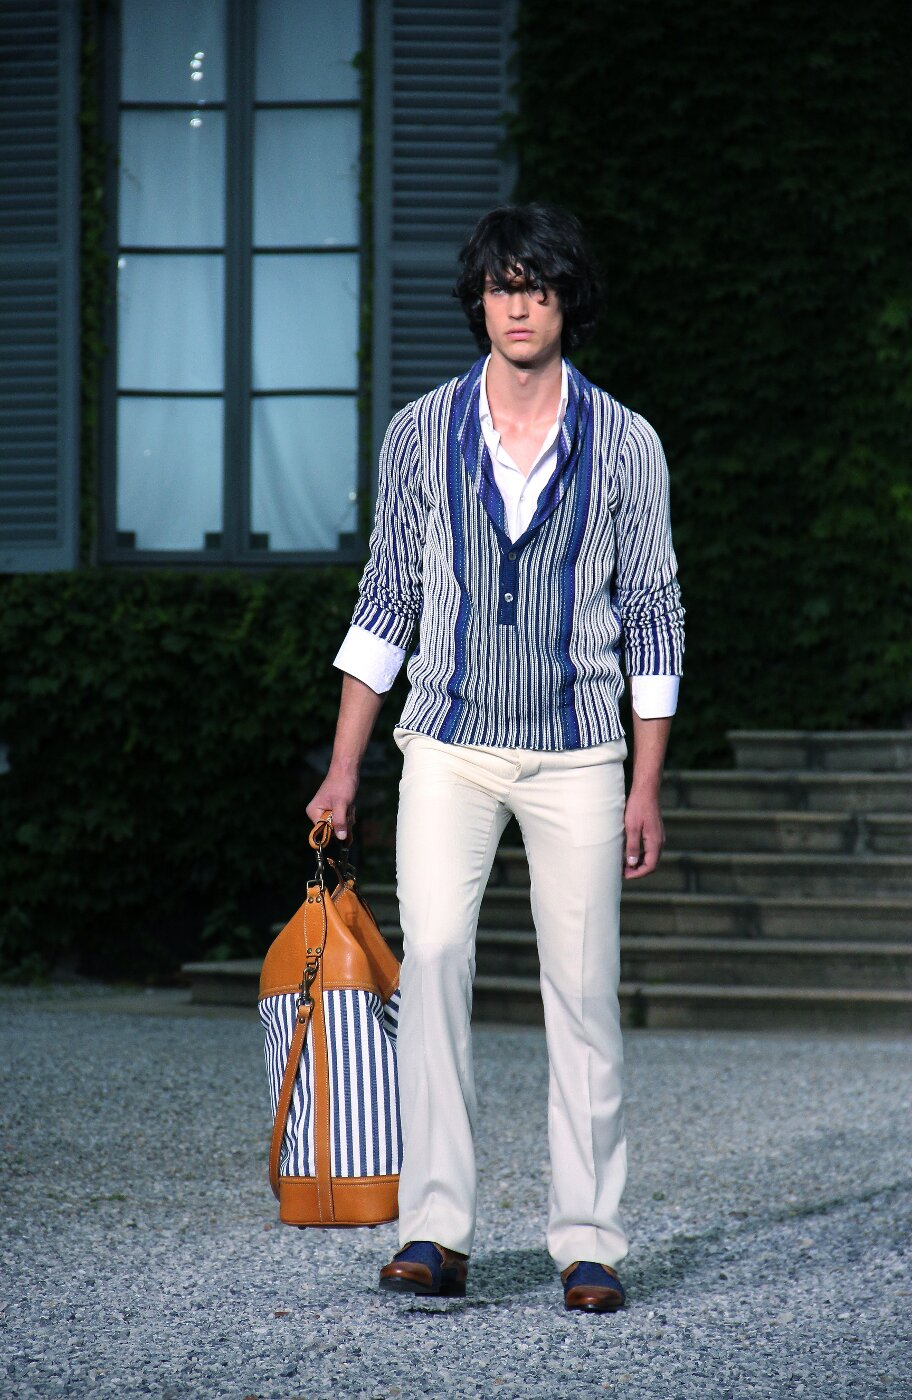 roberto-cavalli-spring-summer-2012-men-collection-milano-fashion-week-2012-roberto-cavalli-primavera-estate-catwalk-2012